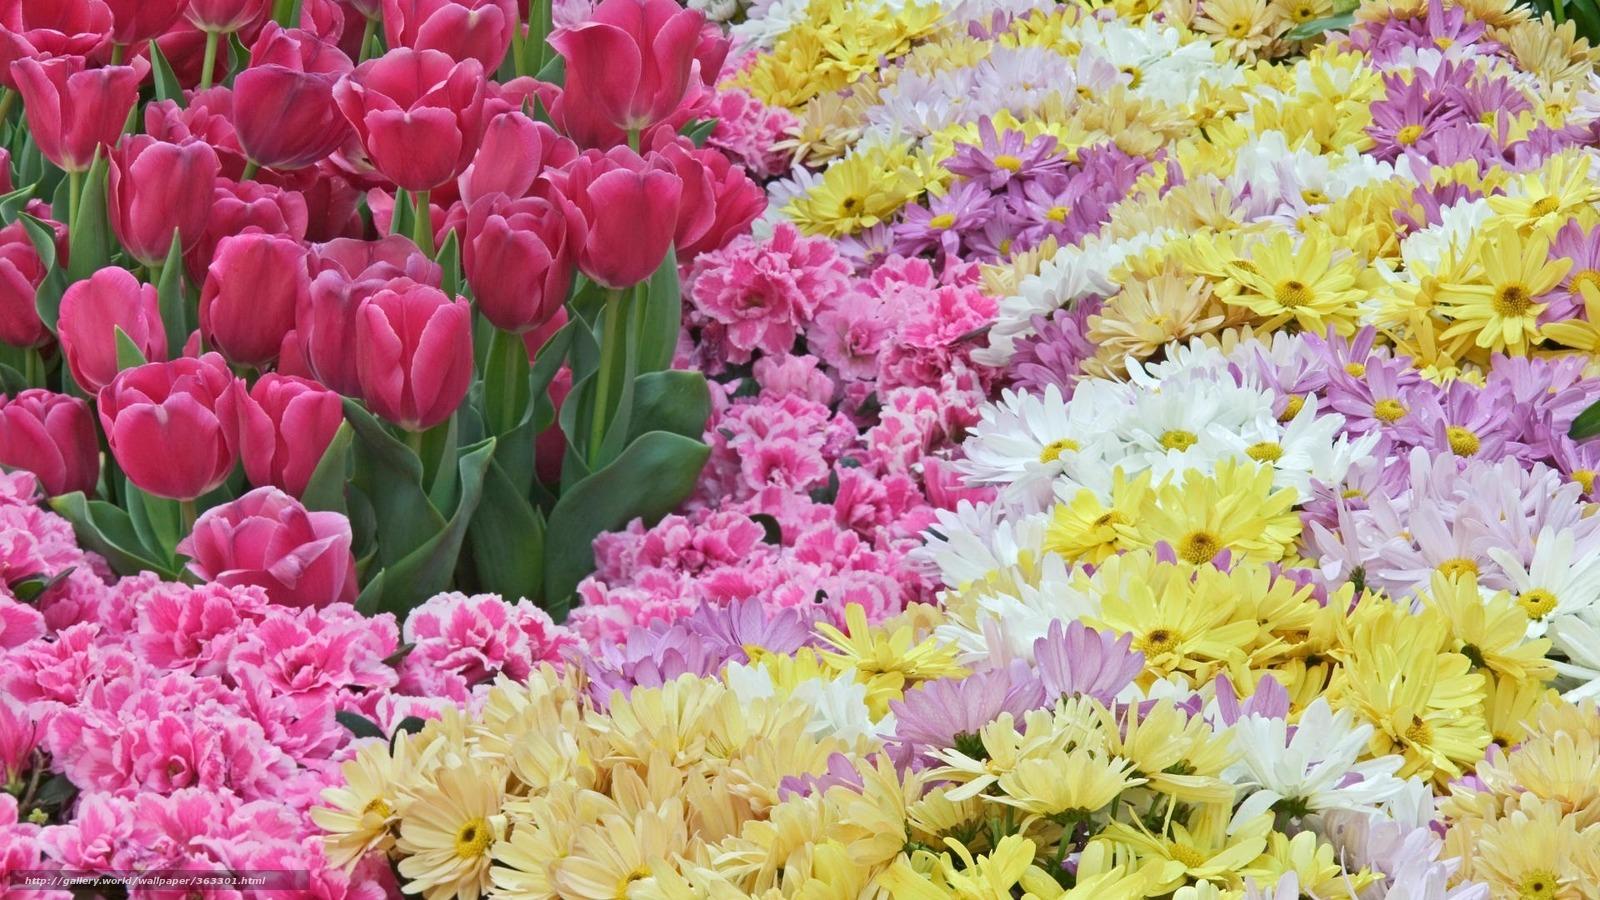 Tlcharger fond d 39 ecran fleurs printemps tulipes rose for Sfondi desktop primavera gratis